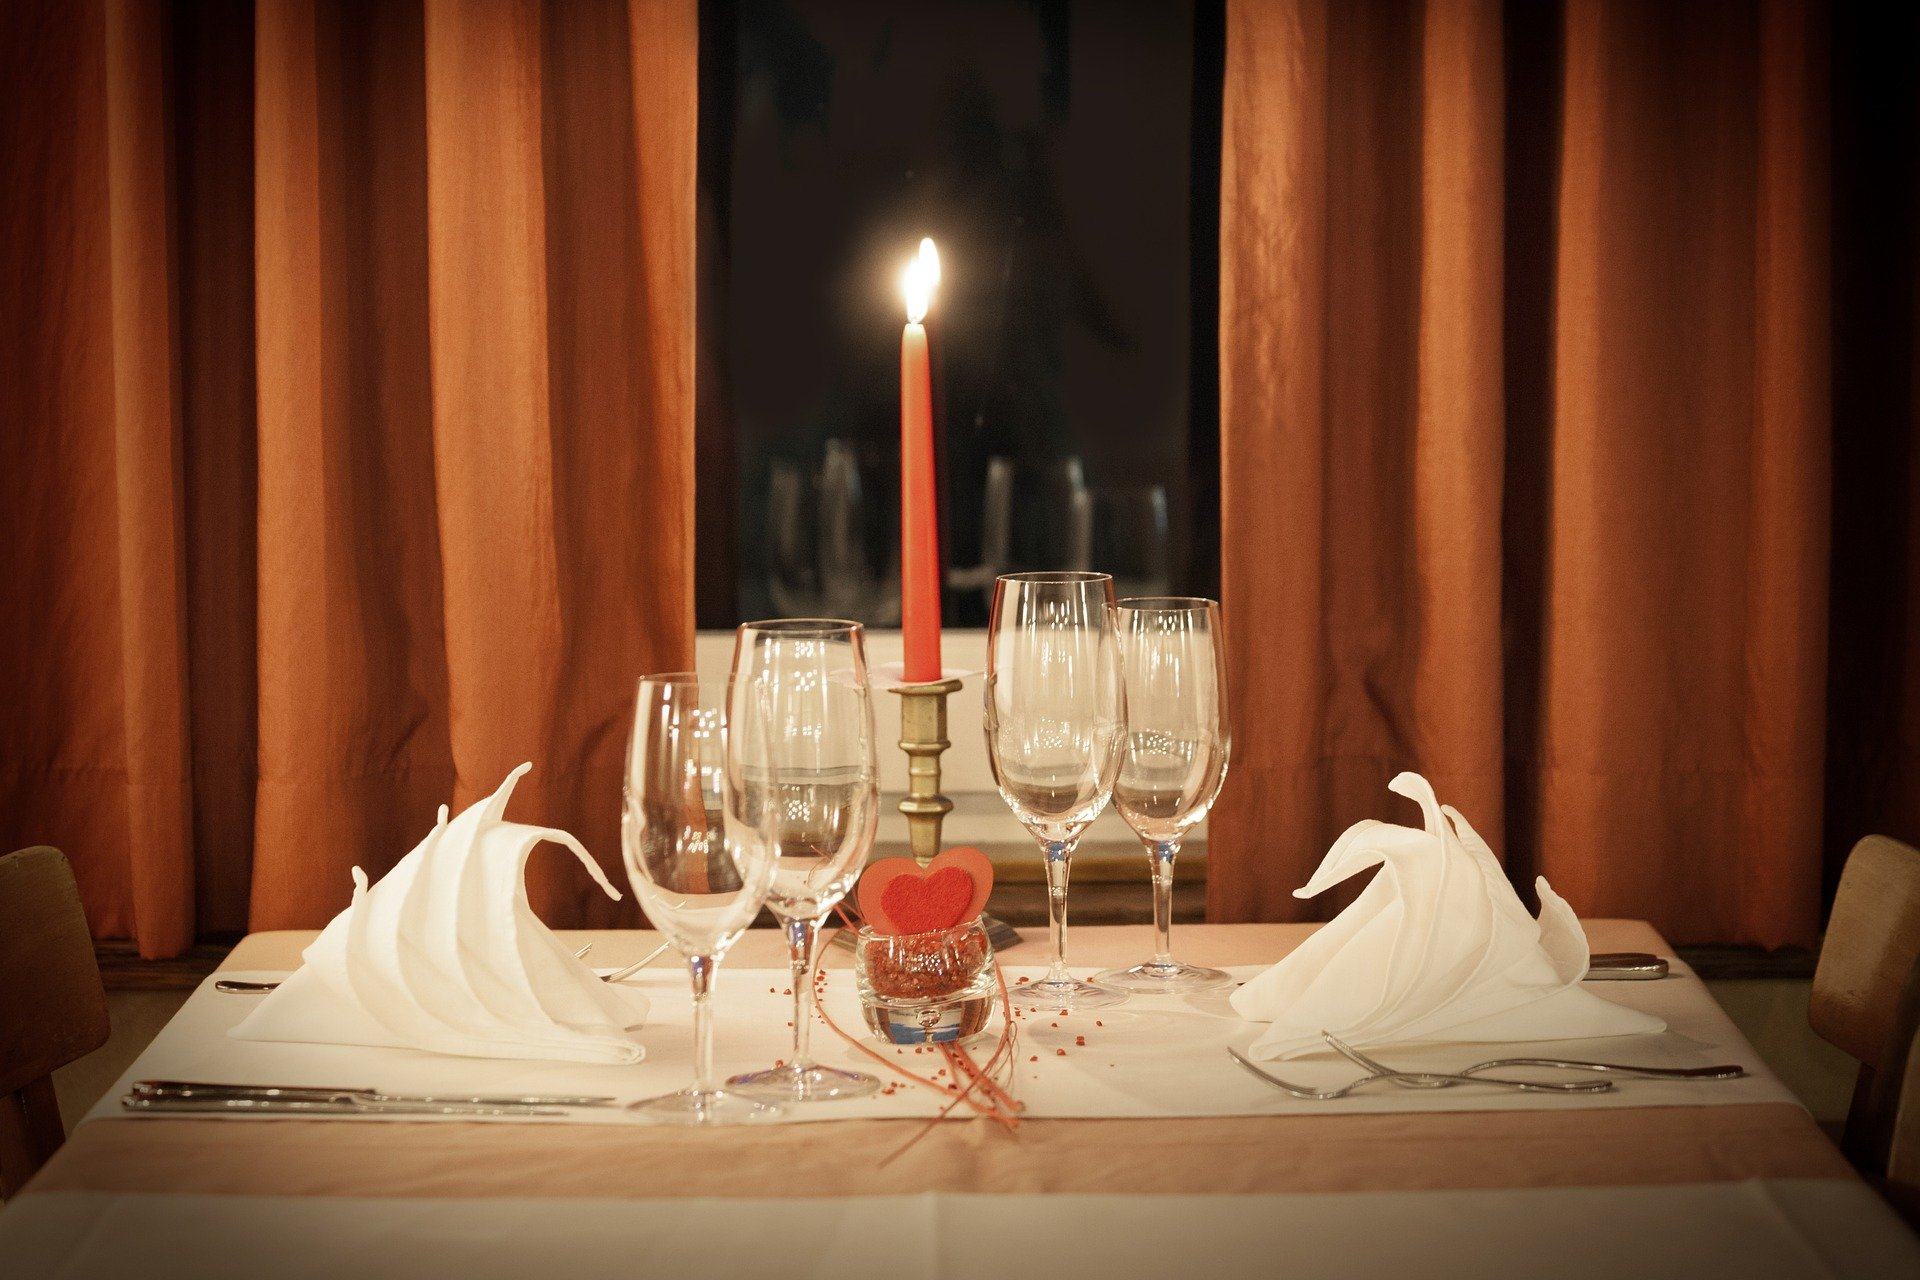 San Valentino offerte ristoranti: